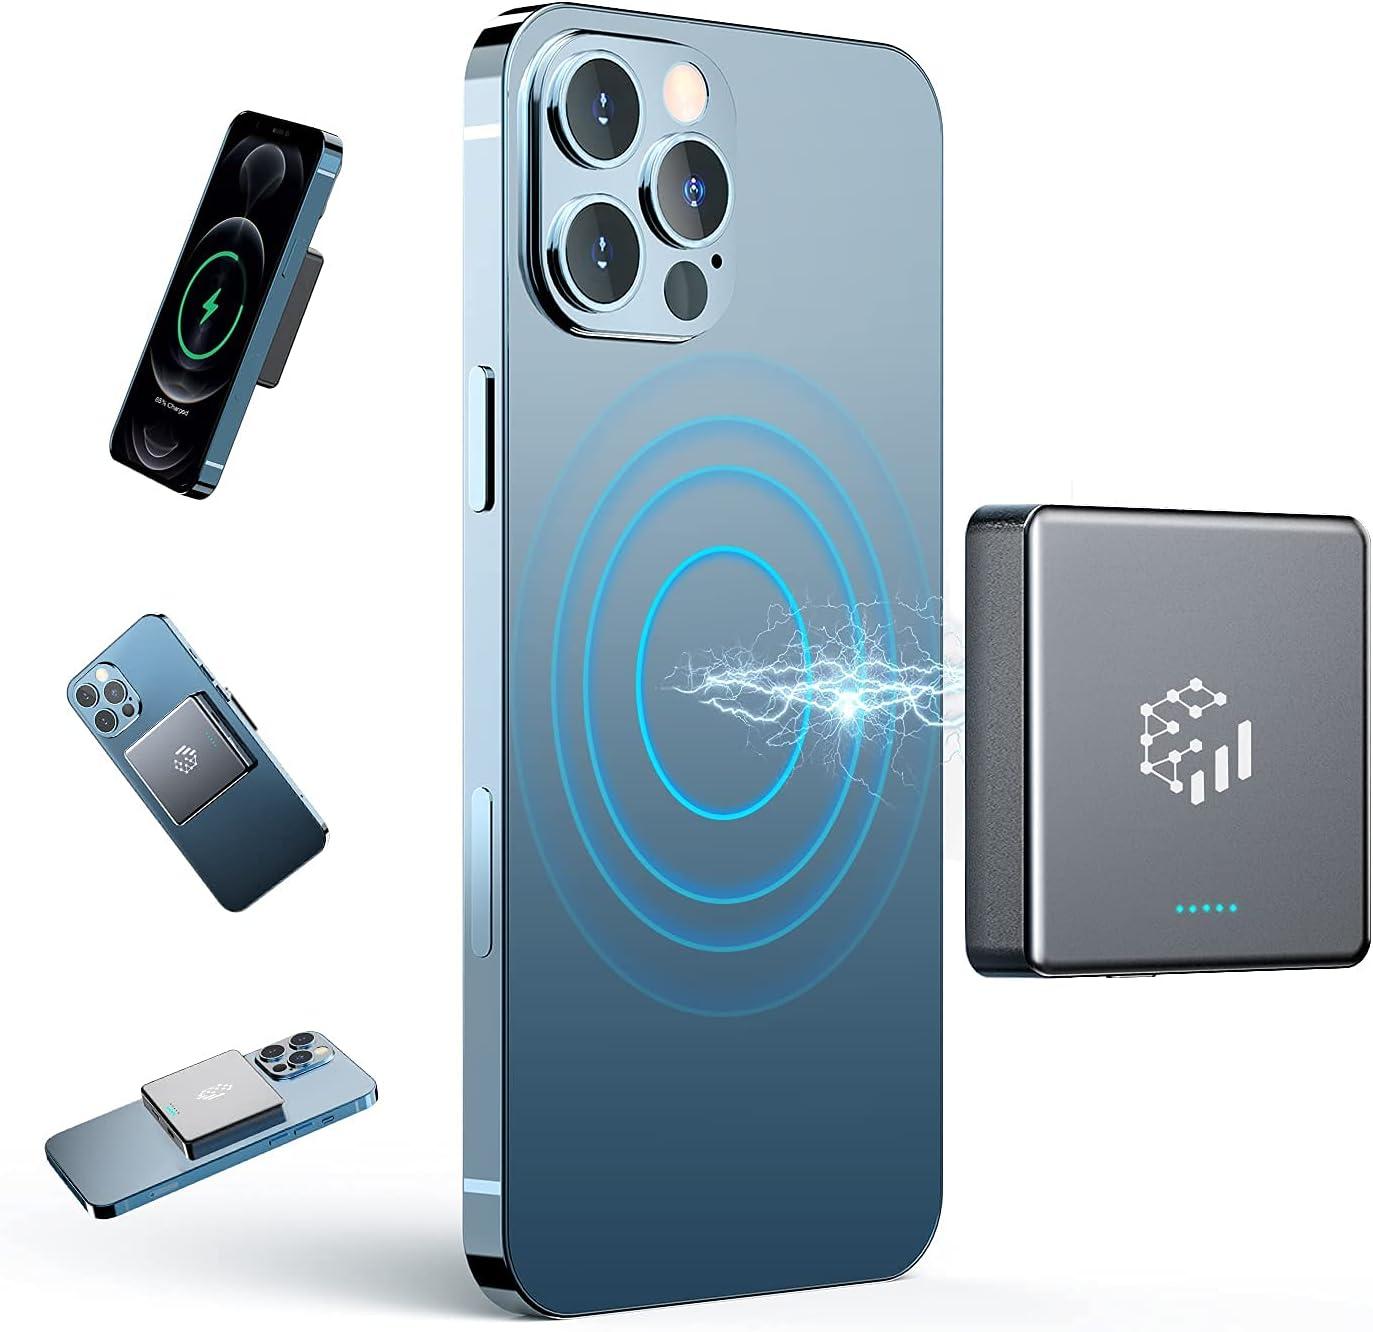 Feerory 10000mAh Magnetic Wireless Power Bank,2021 Twice Battery Capacity But Half Mini Size & Lightweight, 20W Fast Magnetic Wireless Portable Charger for iPhone 12 &13 / Pro/Mini/Pro Max